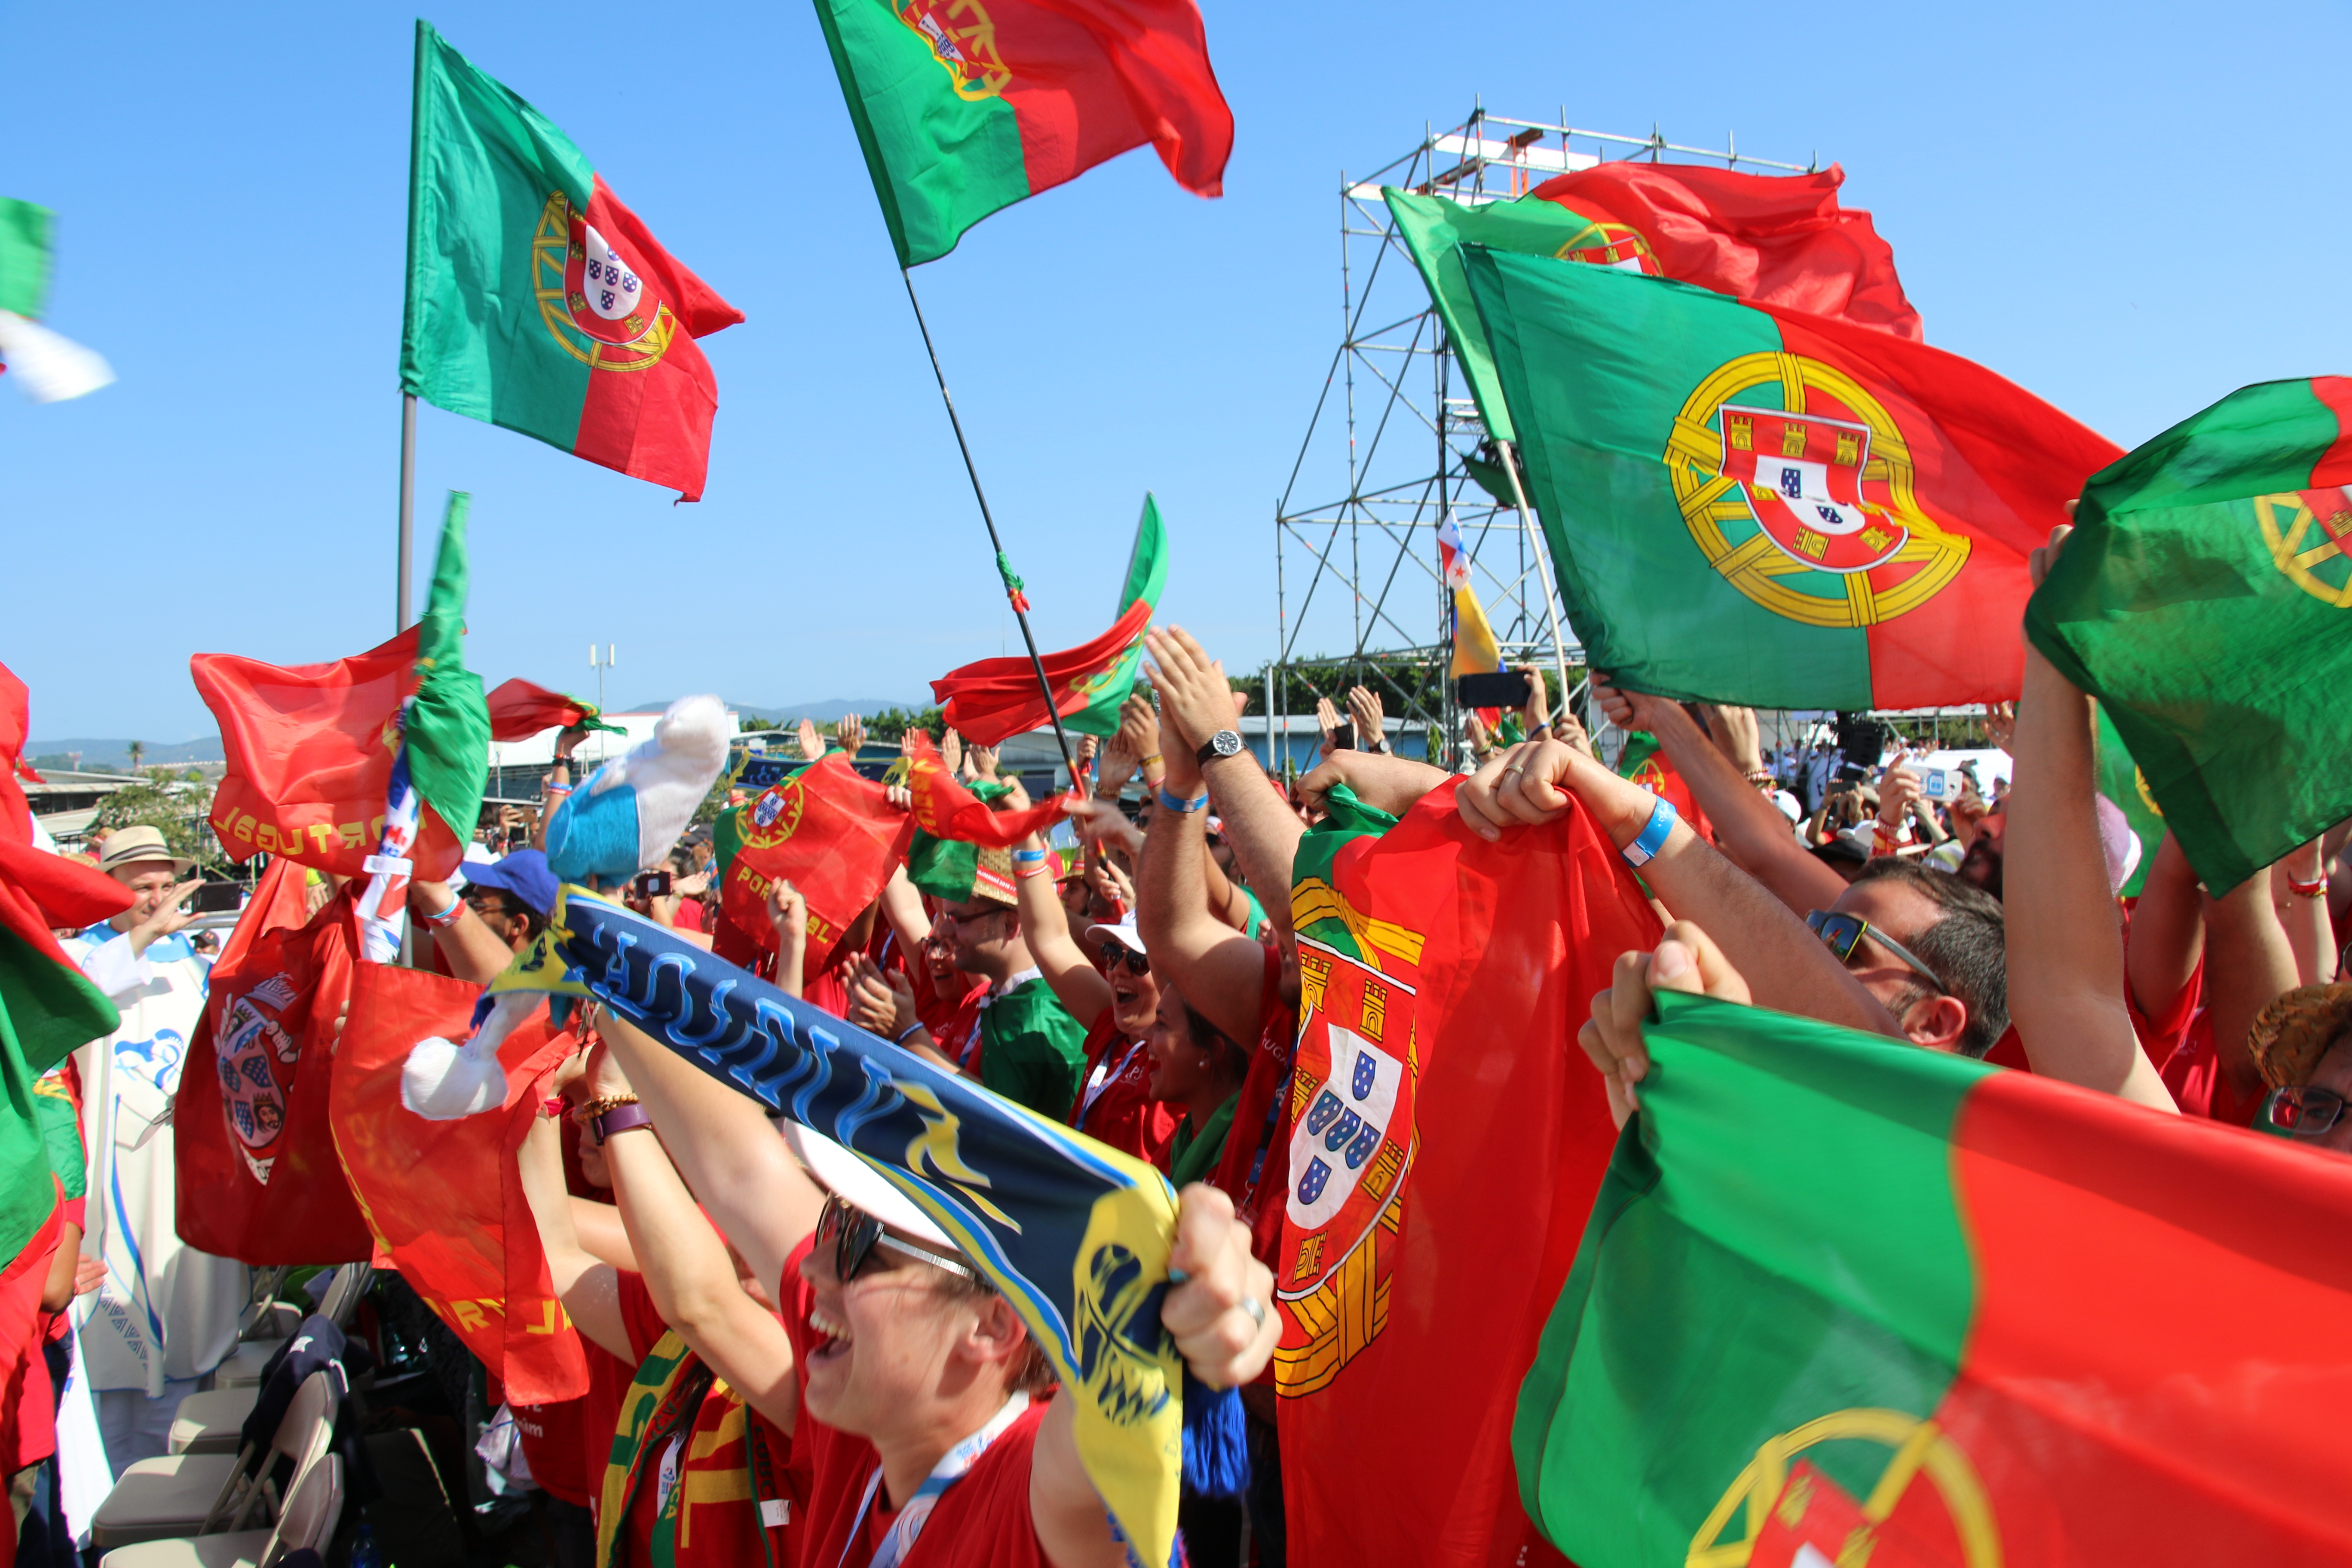 Liesse des jeunes du Portugal, Panama © Santuário de Fátima